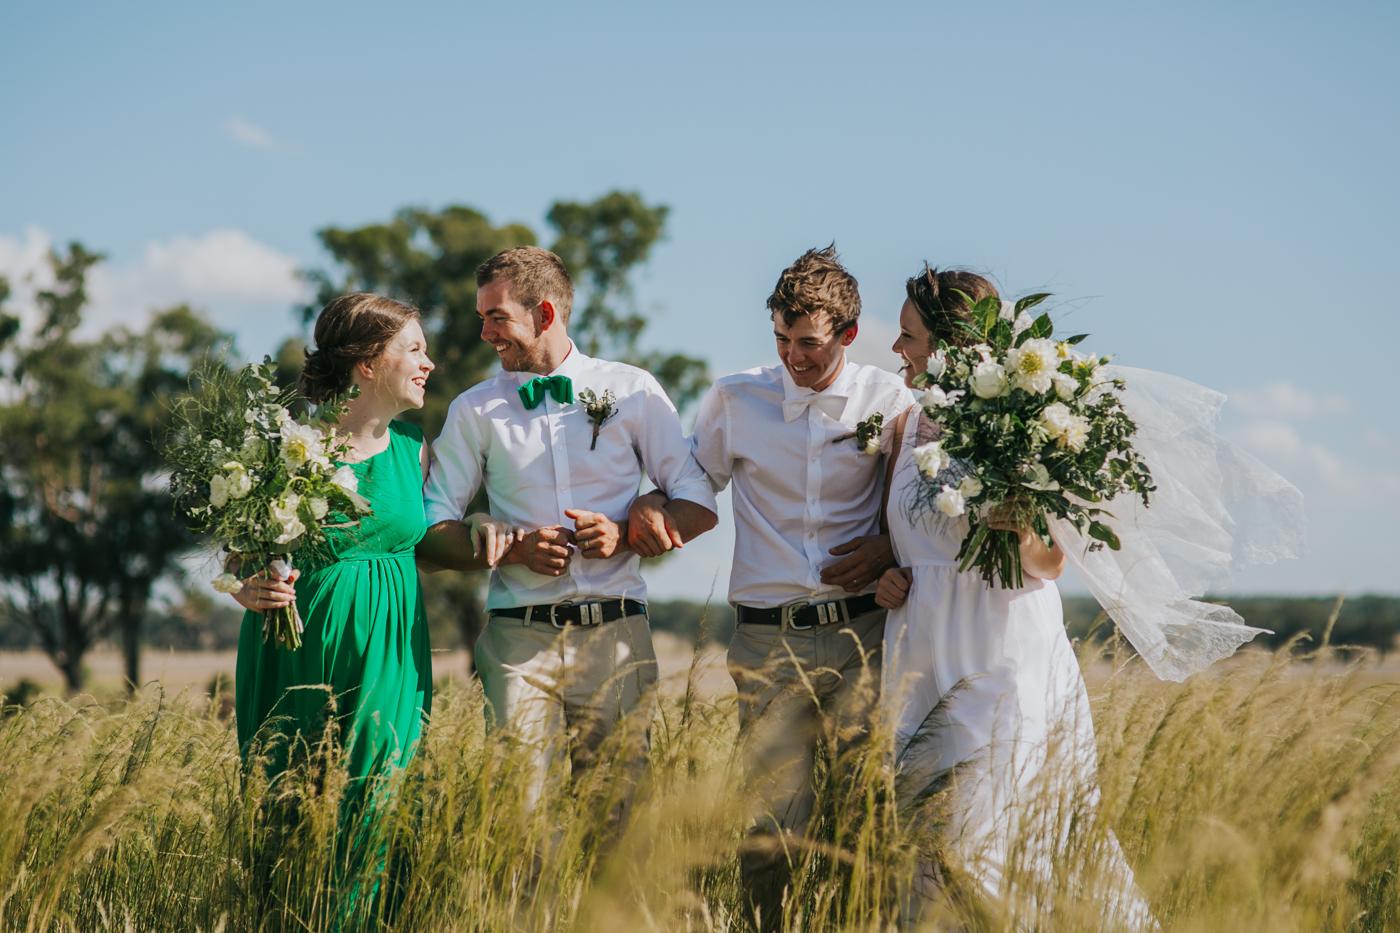 Nicolle & Jacob - Dubbo Wedding - Country Australia - Samantha Heather Photography-166.jpg